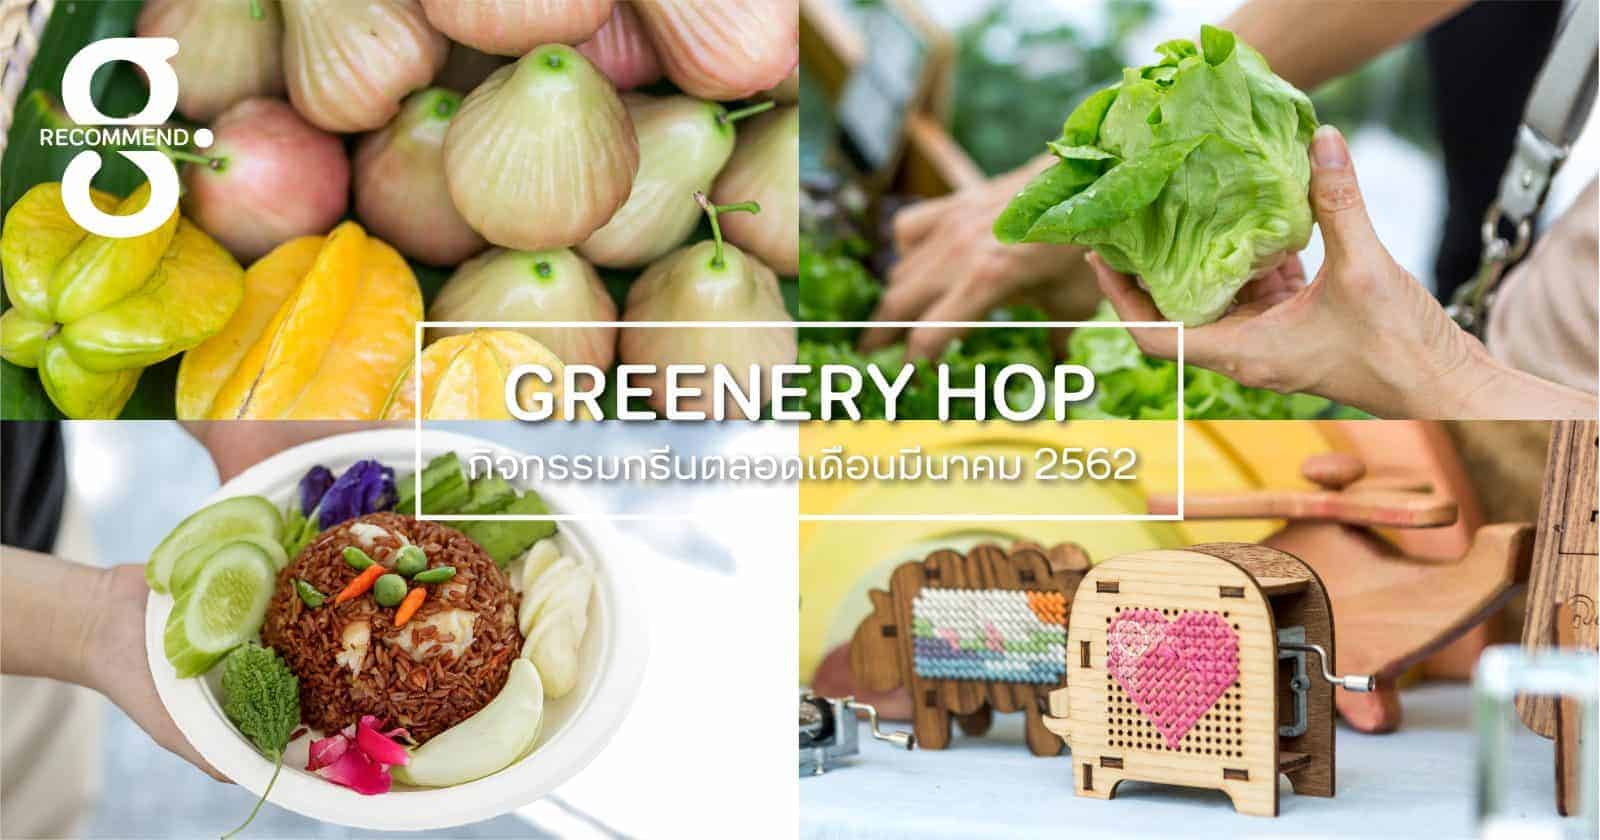 Greenery HOP: มีนาพากรีน เที่ยวชิม แวะช้อปให้สุขภาพดีและรักษ์โลกไปพร้อมๆ กัน